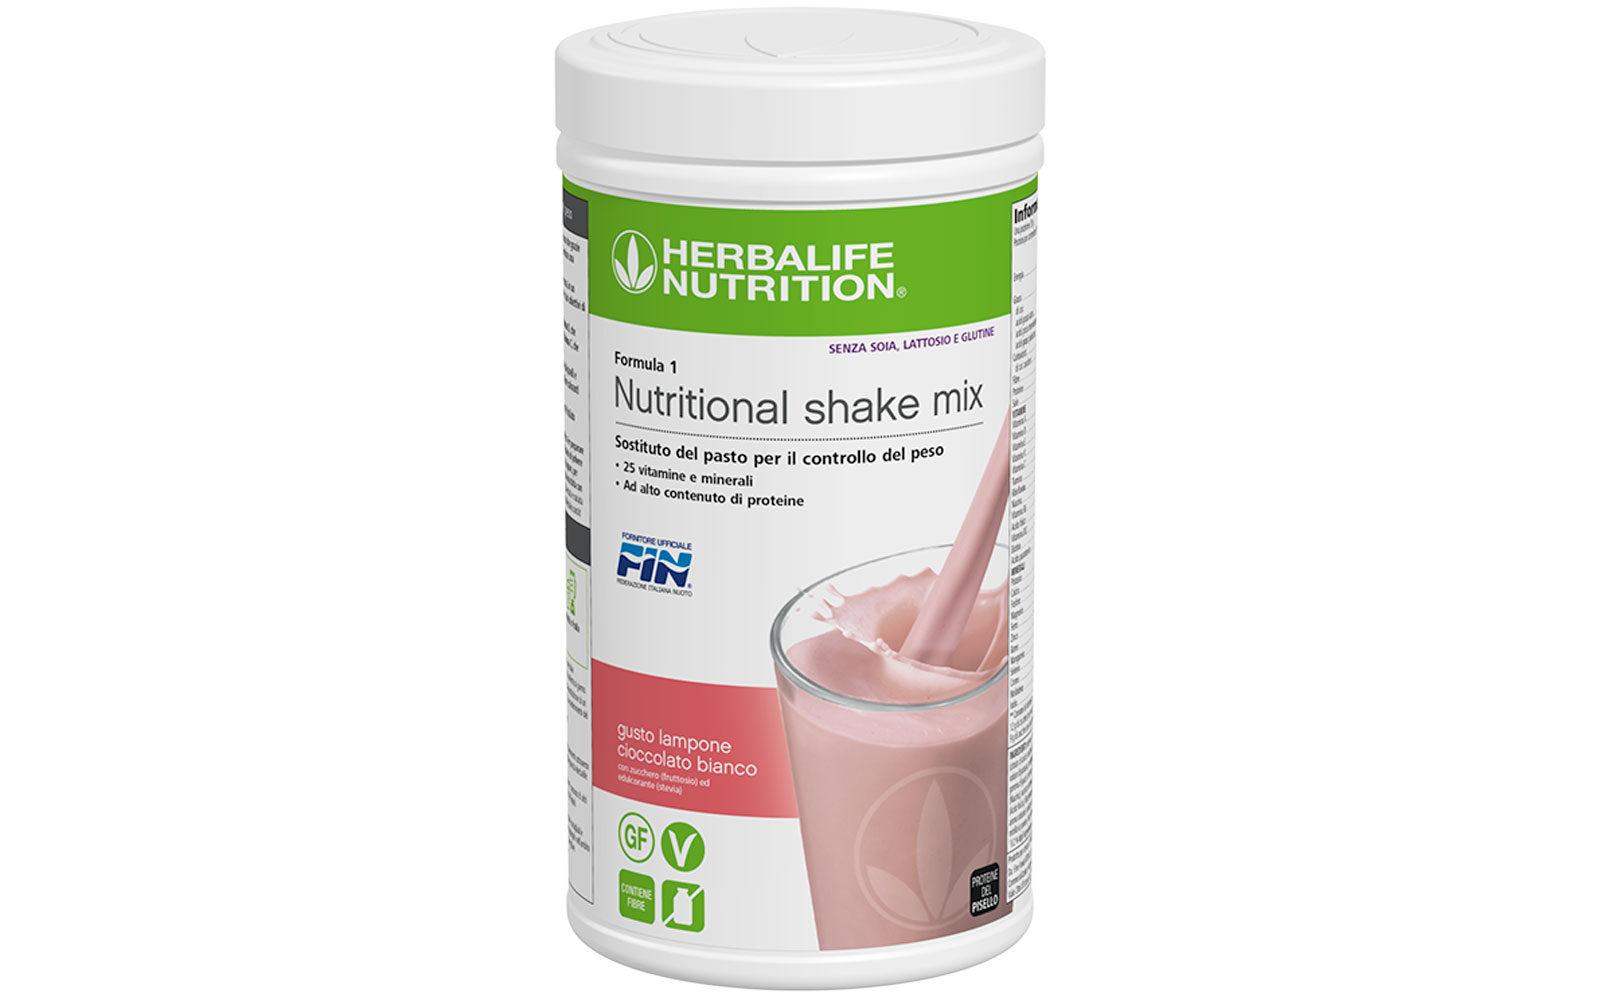 Herbalife Nutrition Nutritional shake mix – Gusto Lampone e Cioccolato bianco